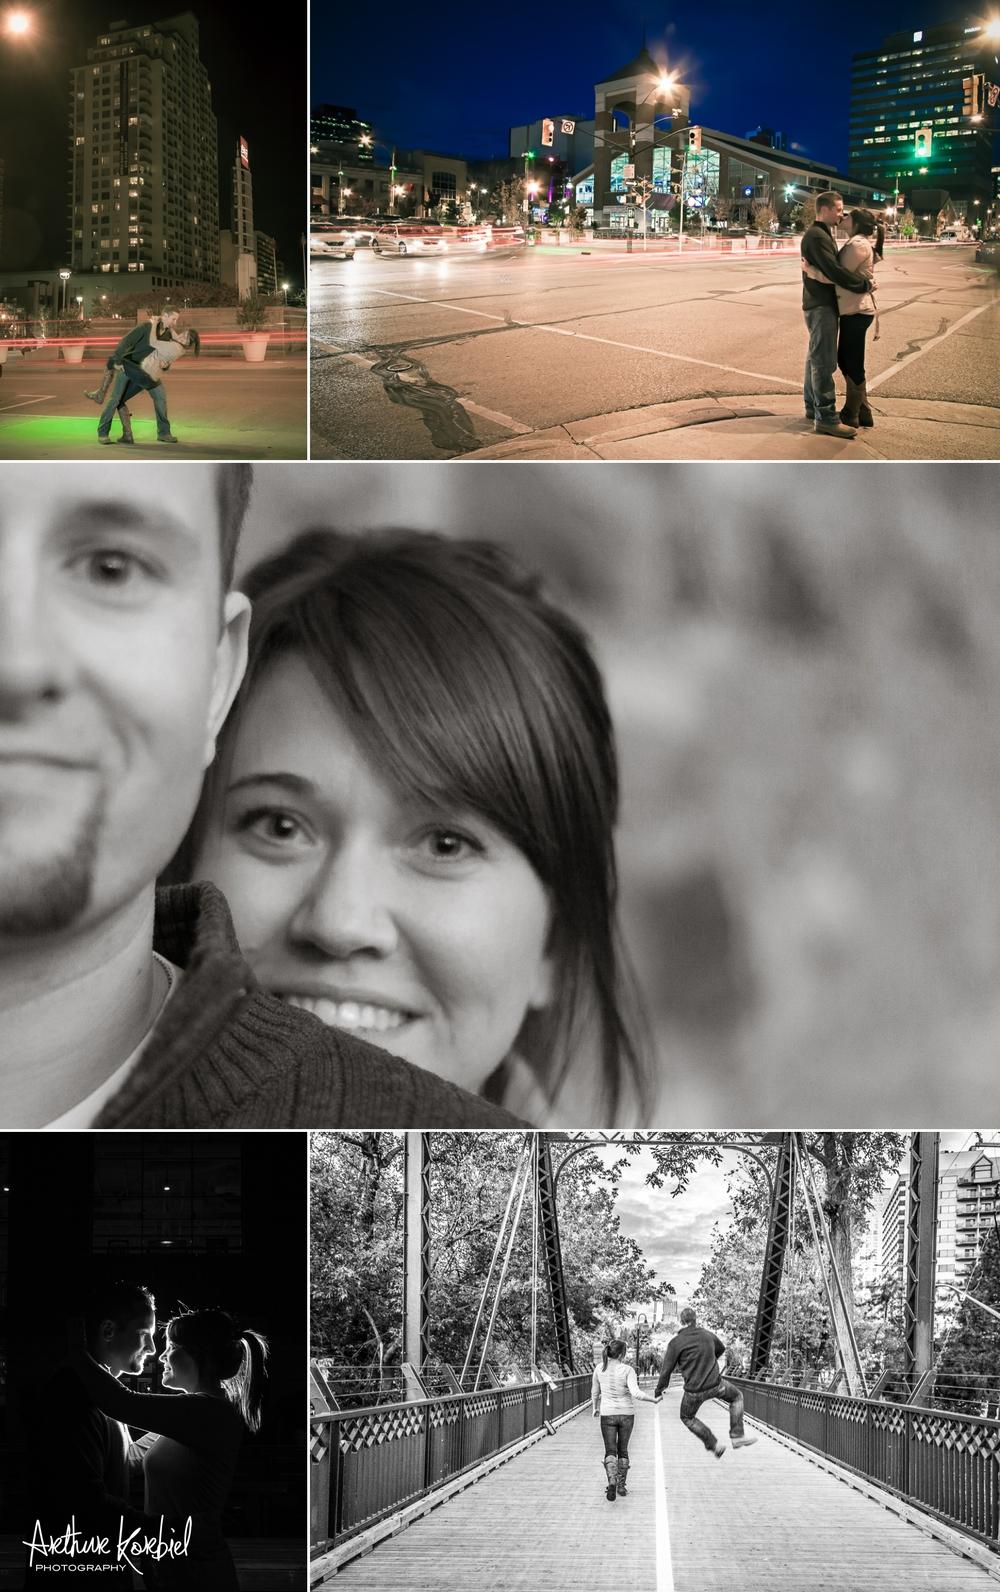 Arthur Korbiel Photography - London Engagement Photographer - Katie & Mike_008.jpg